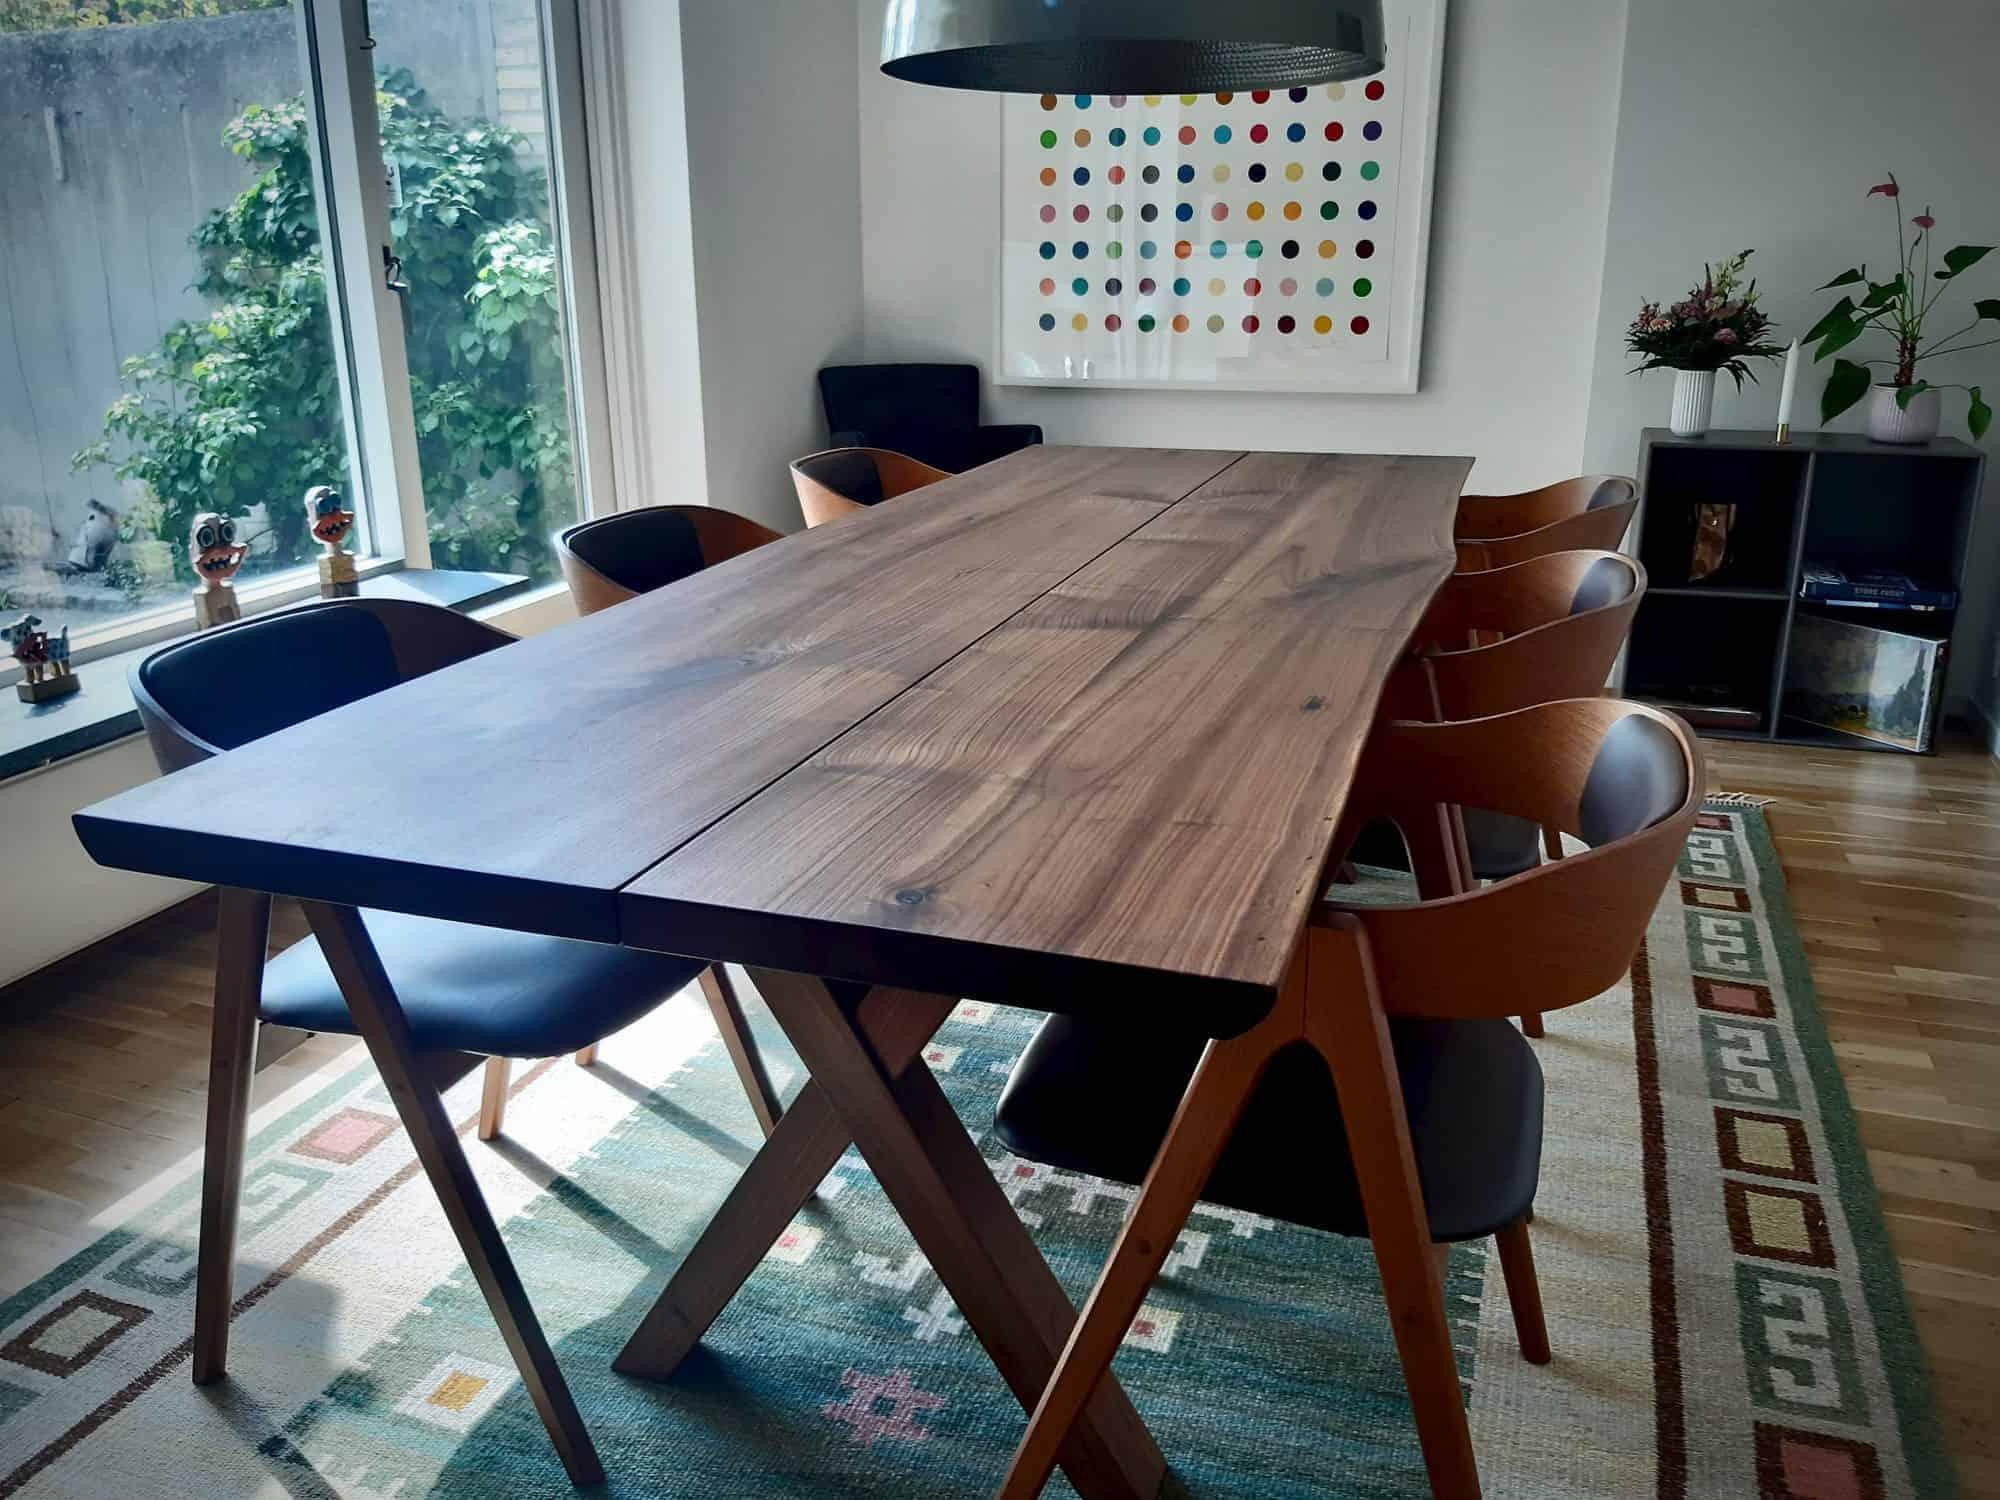 plankebord planke bord i trae Kaerbygård 22 scaled